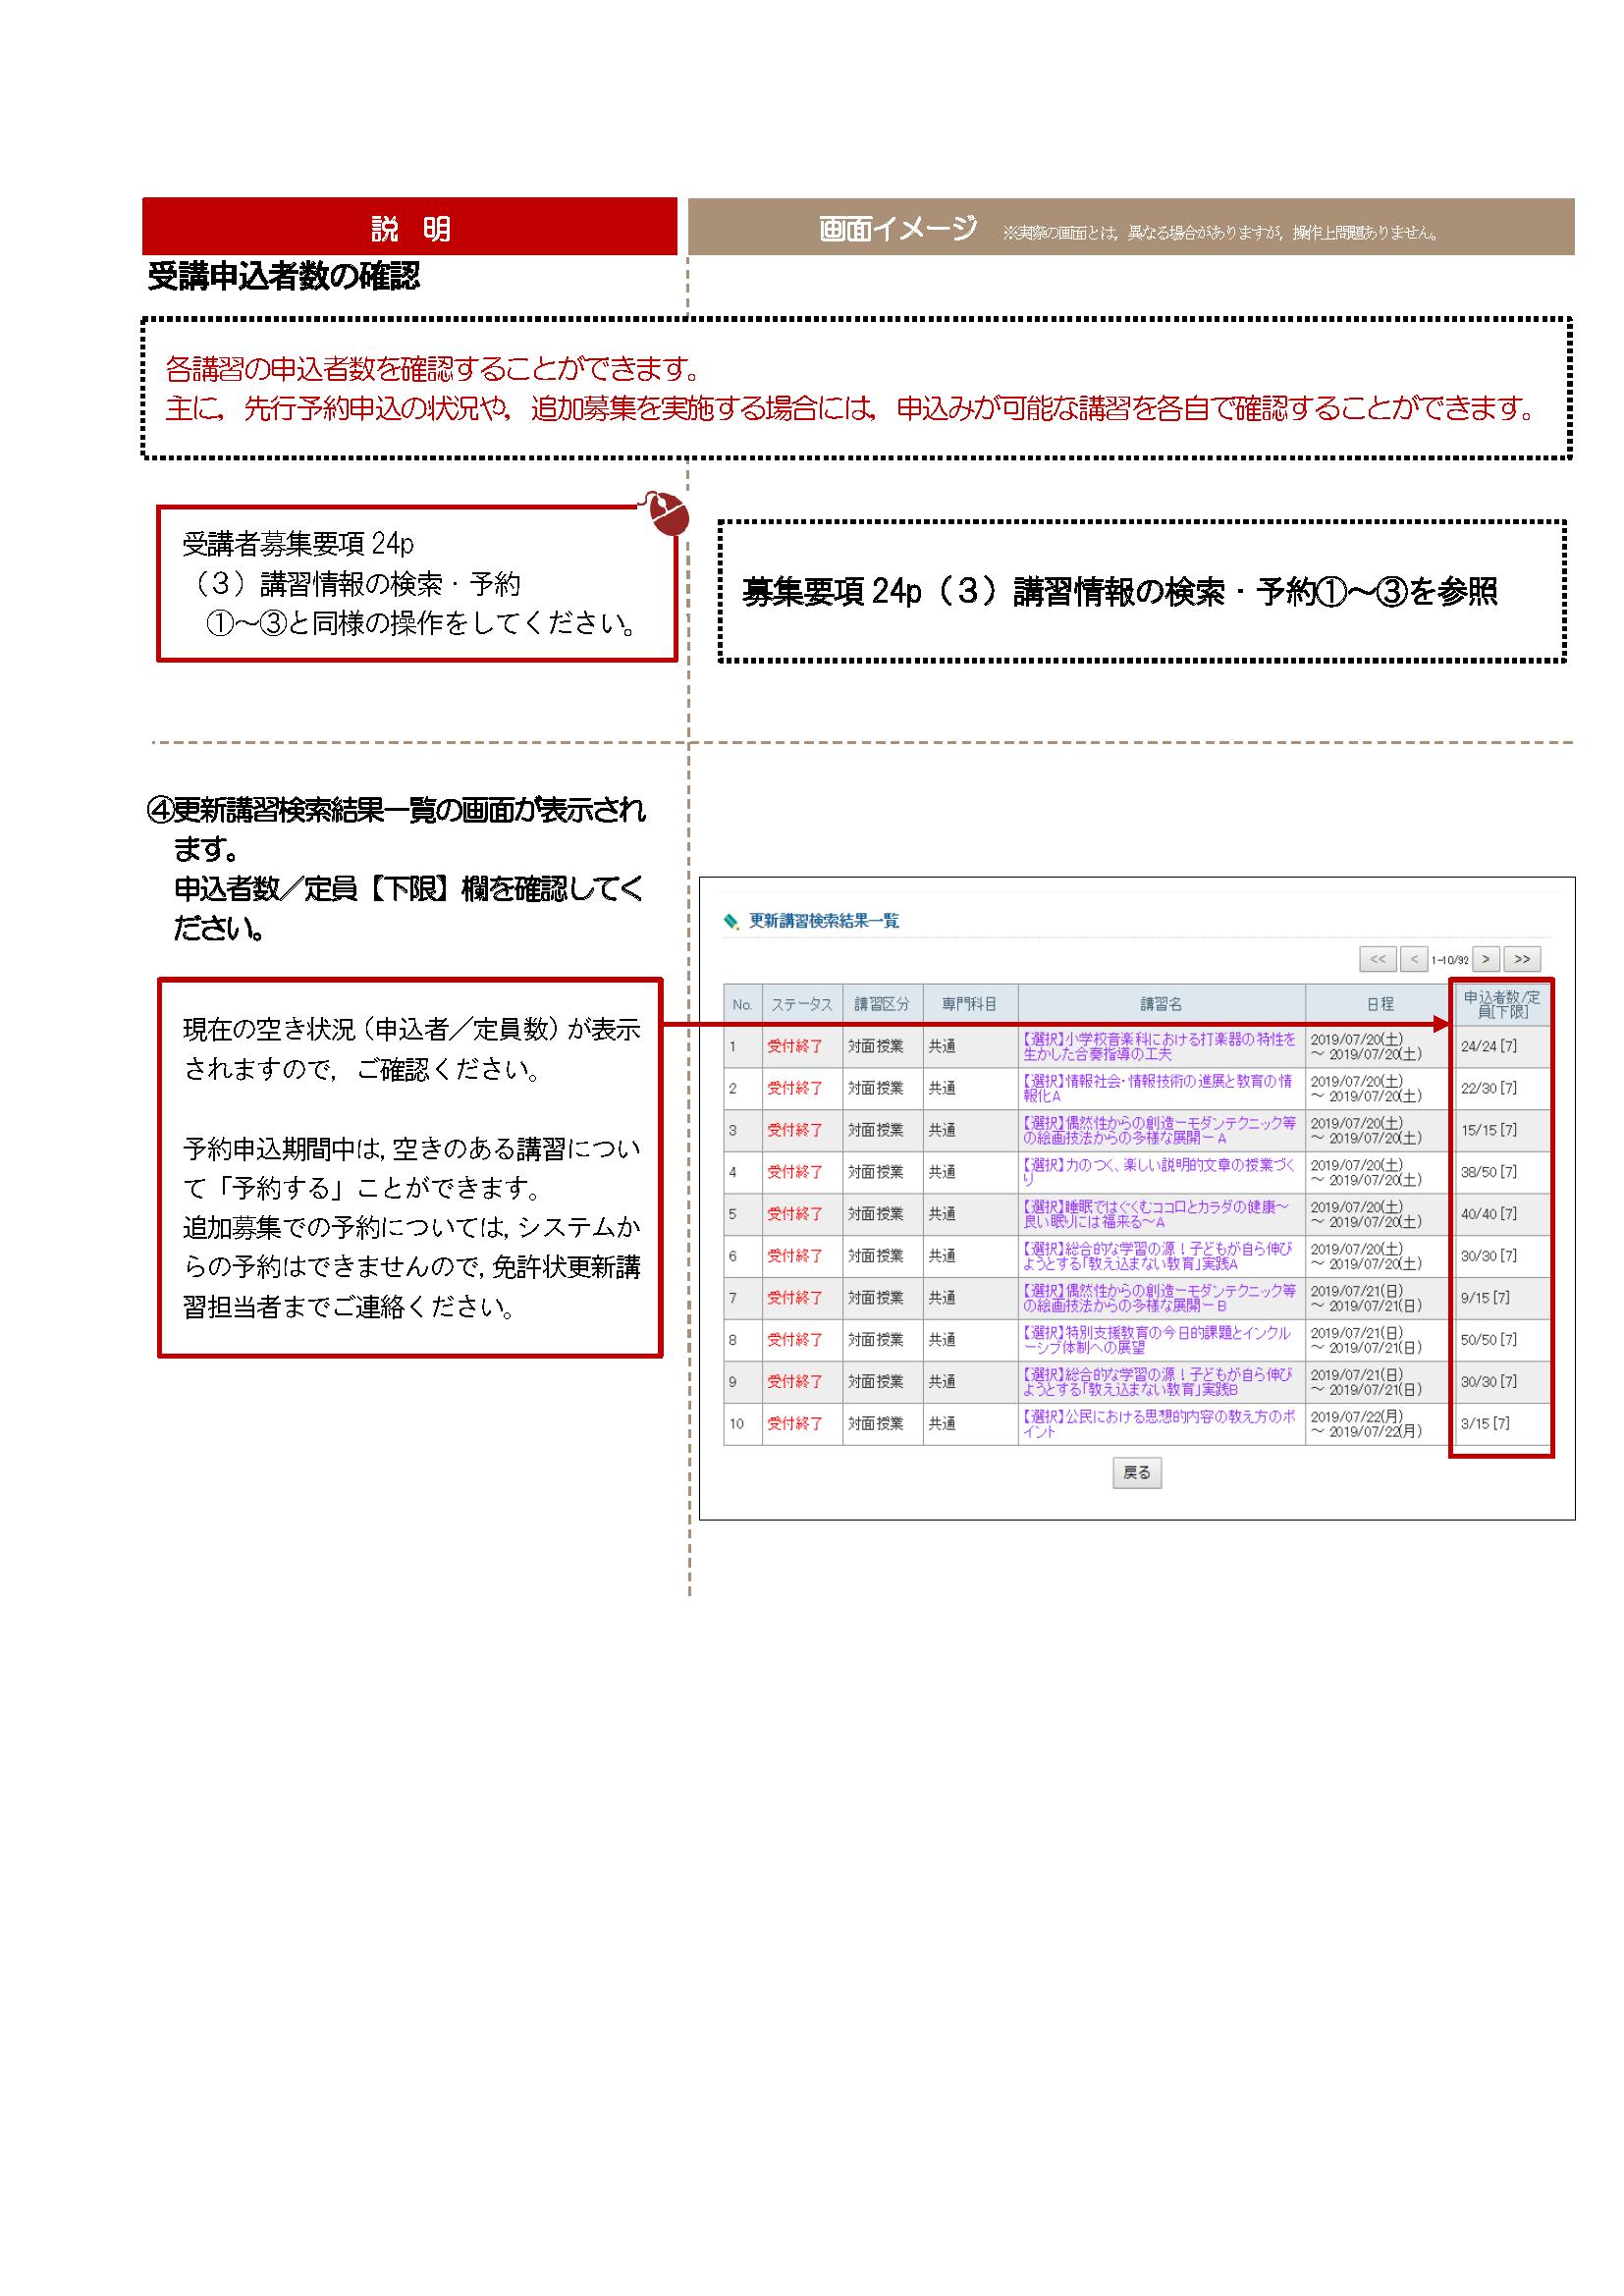 https://www.hyogo-u.ac.jp/assets_file/2019/05/2019menkyomousikomisyasu-thumb-700x989-30248.png